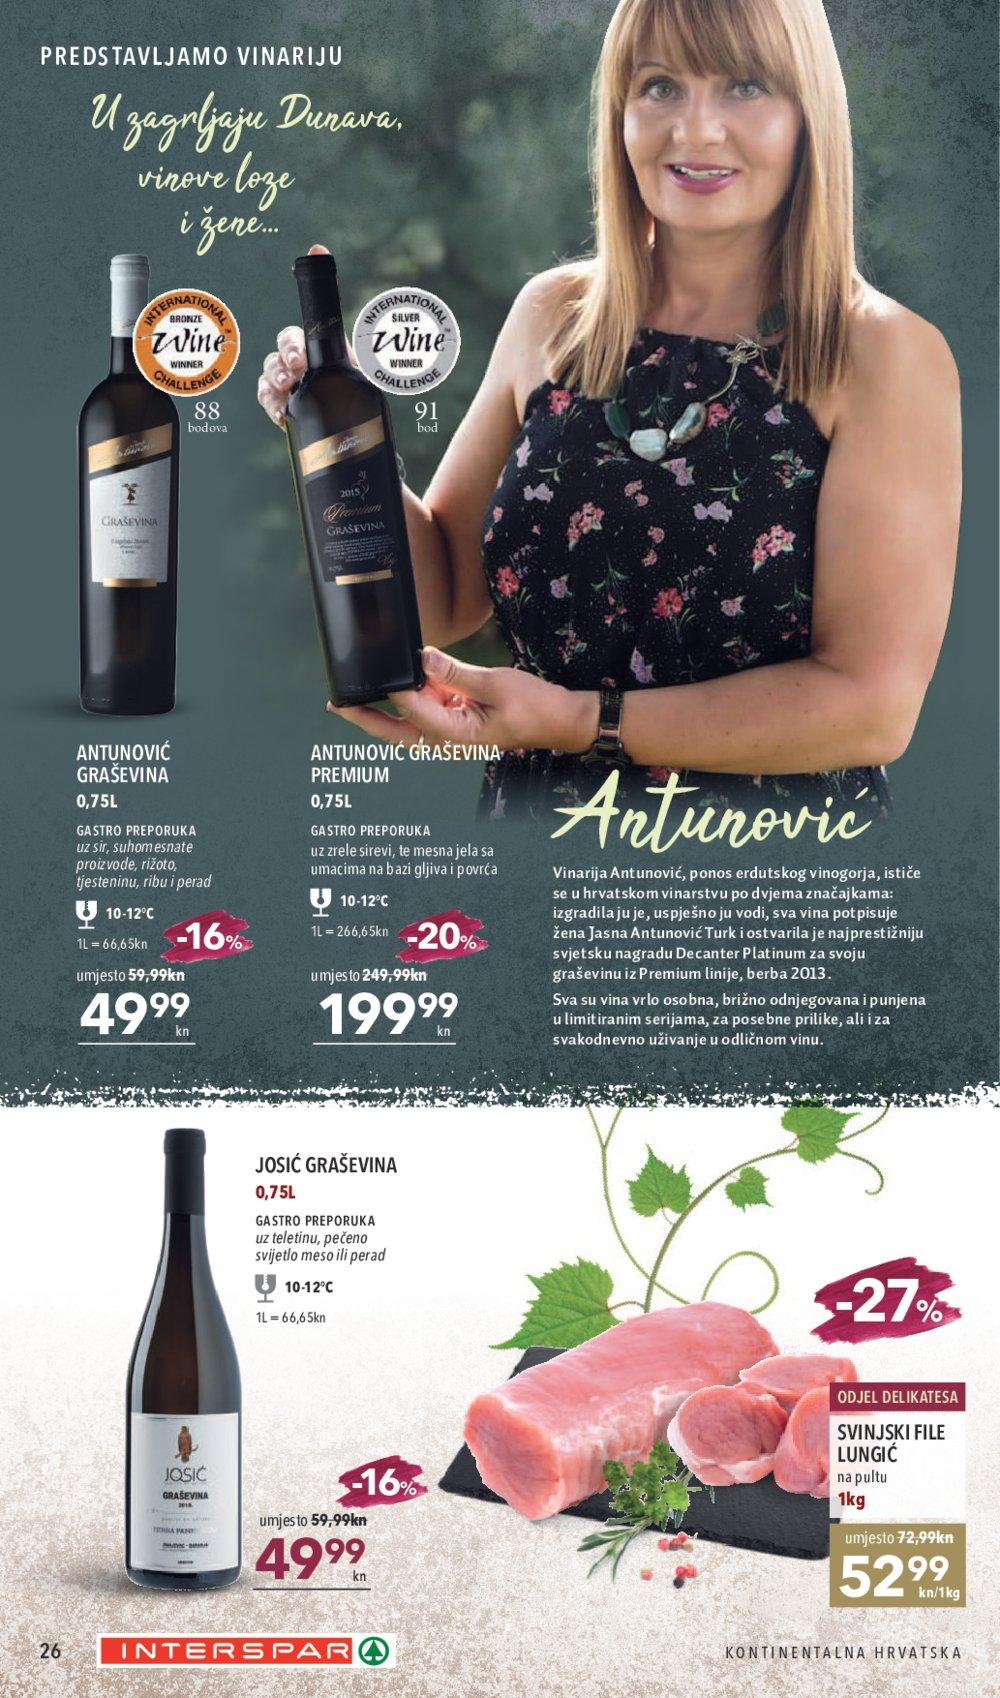 Interspar katalog Vina 25.09.-15.10.2019.